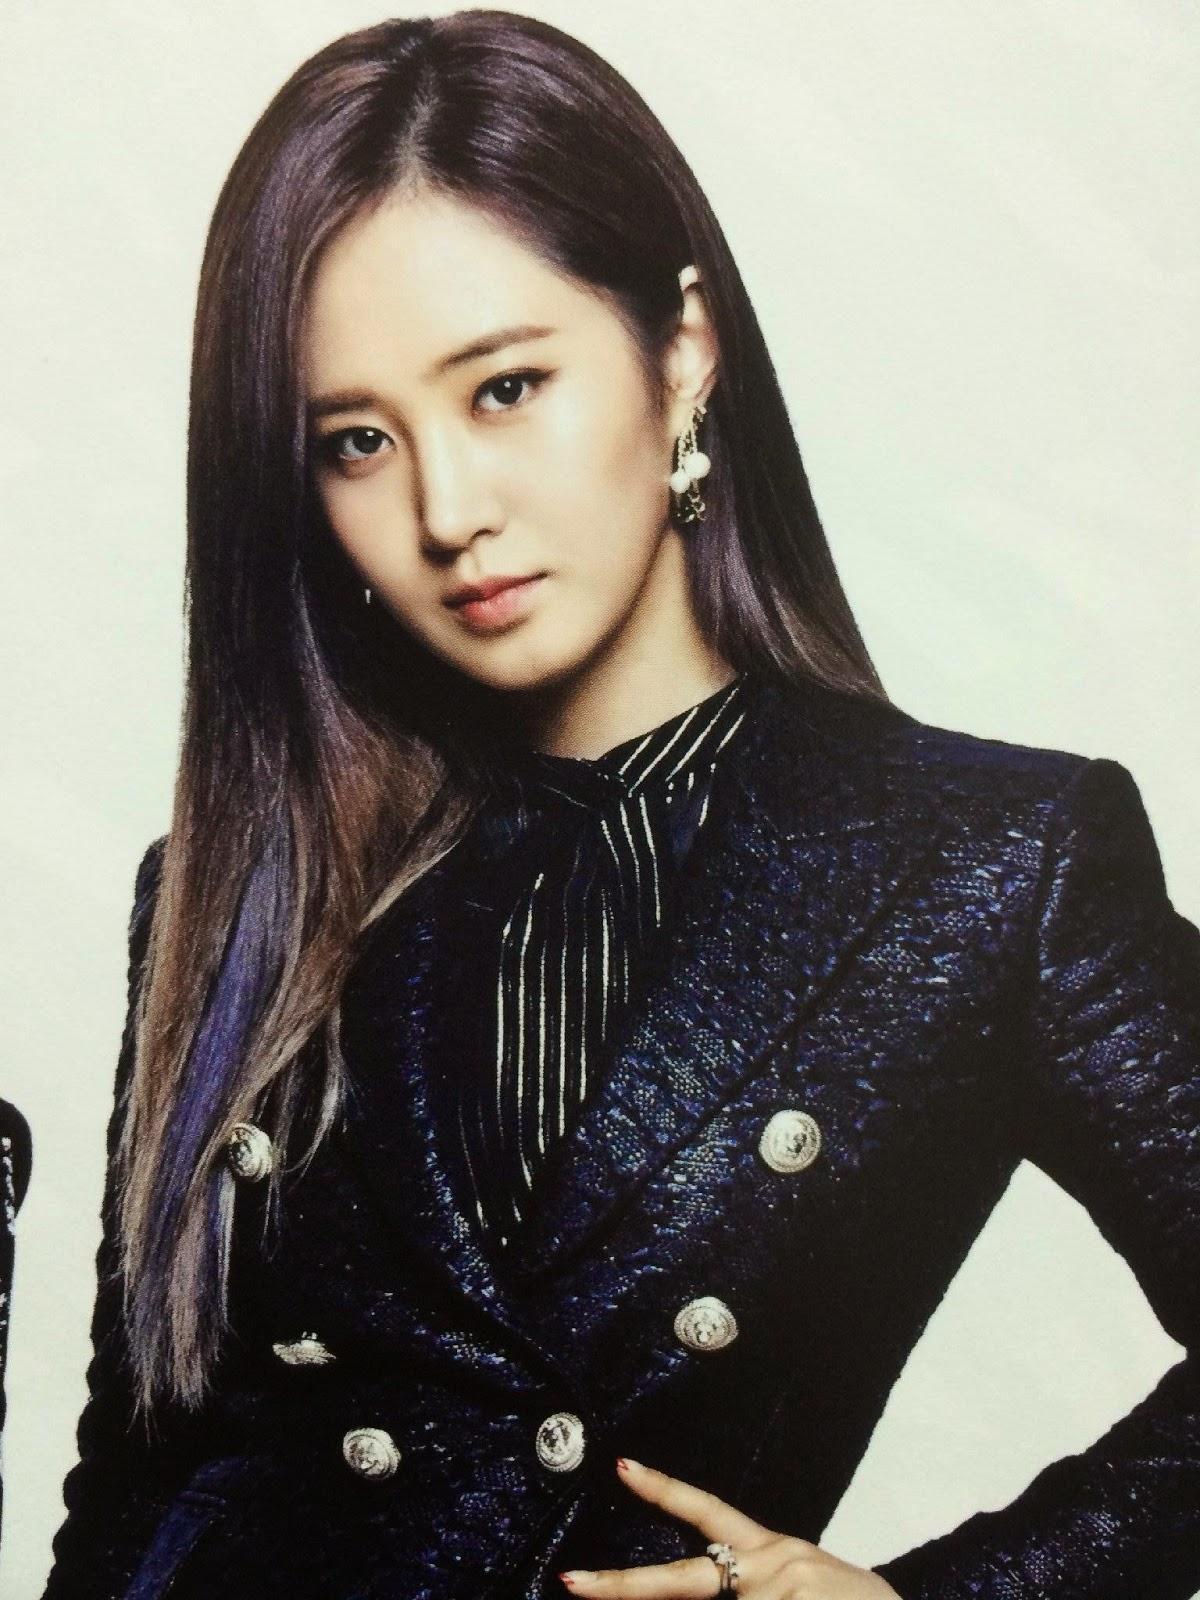 SNSD Yuri (유리; ユリ) Girls Generation The Best Scan Photos